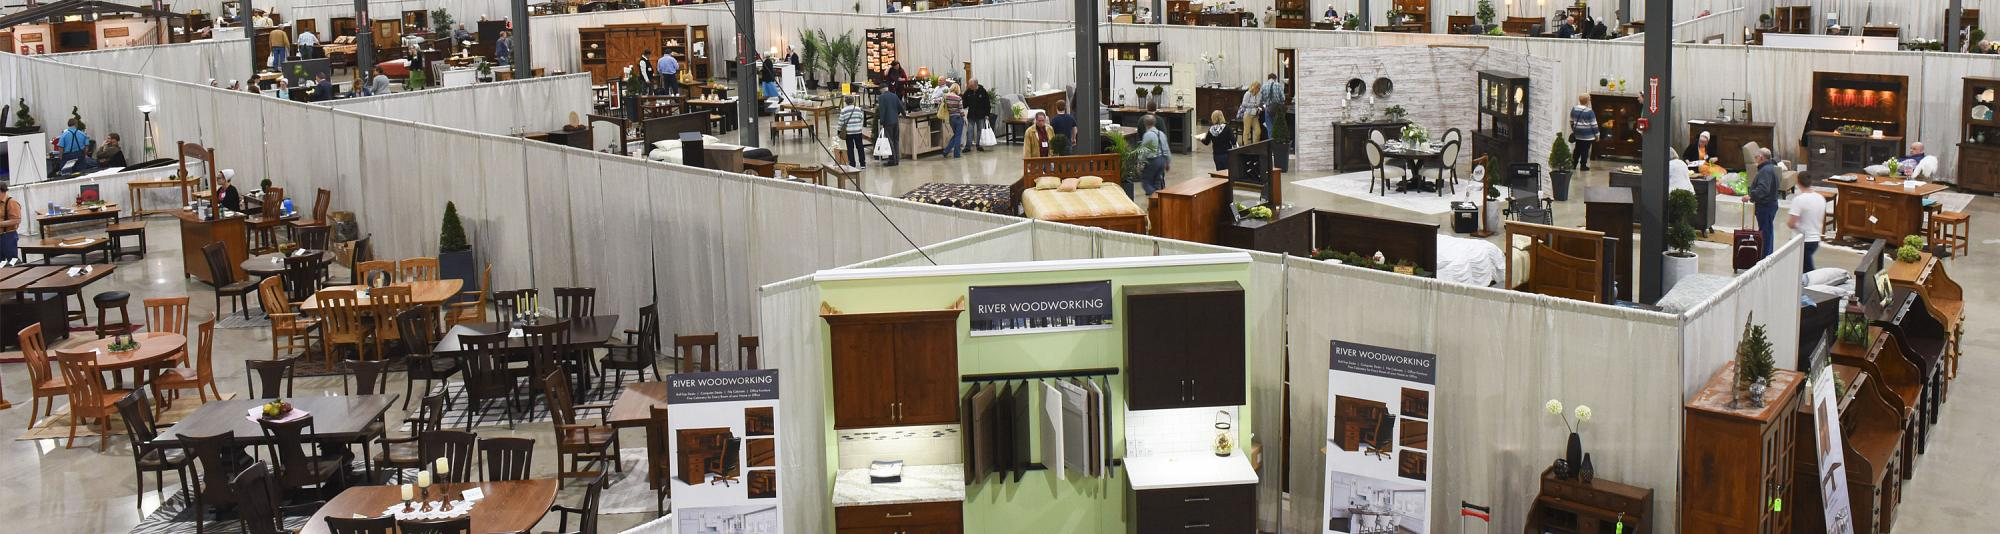 NIWA-2018-Amish-Furniture-Expo-Trade-Show-Booths.jpg